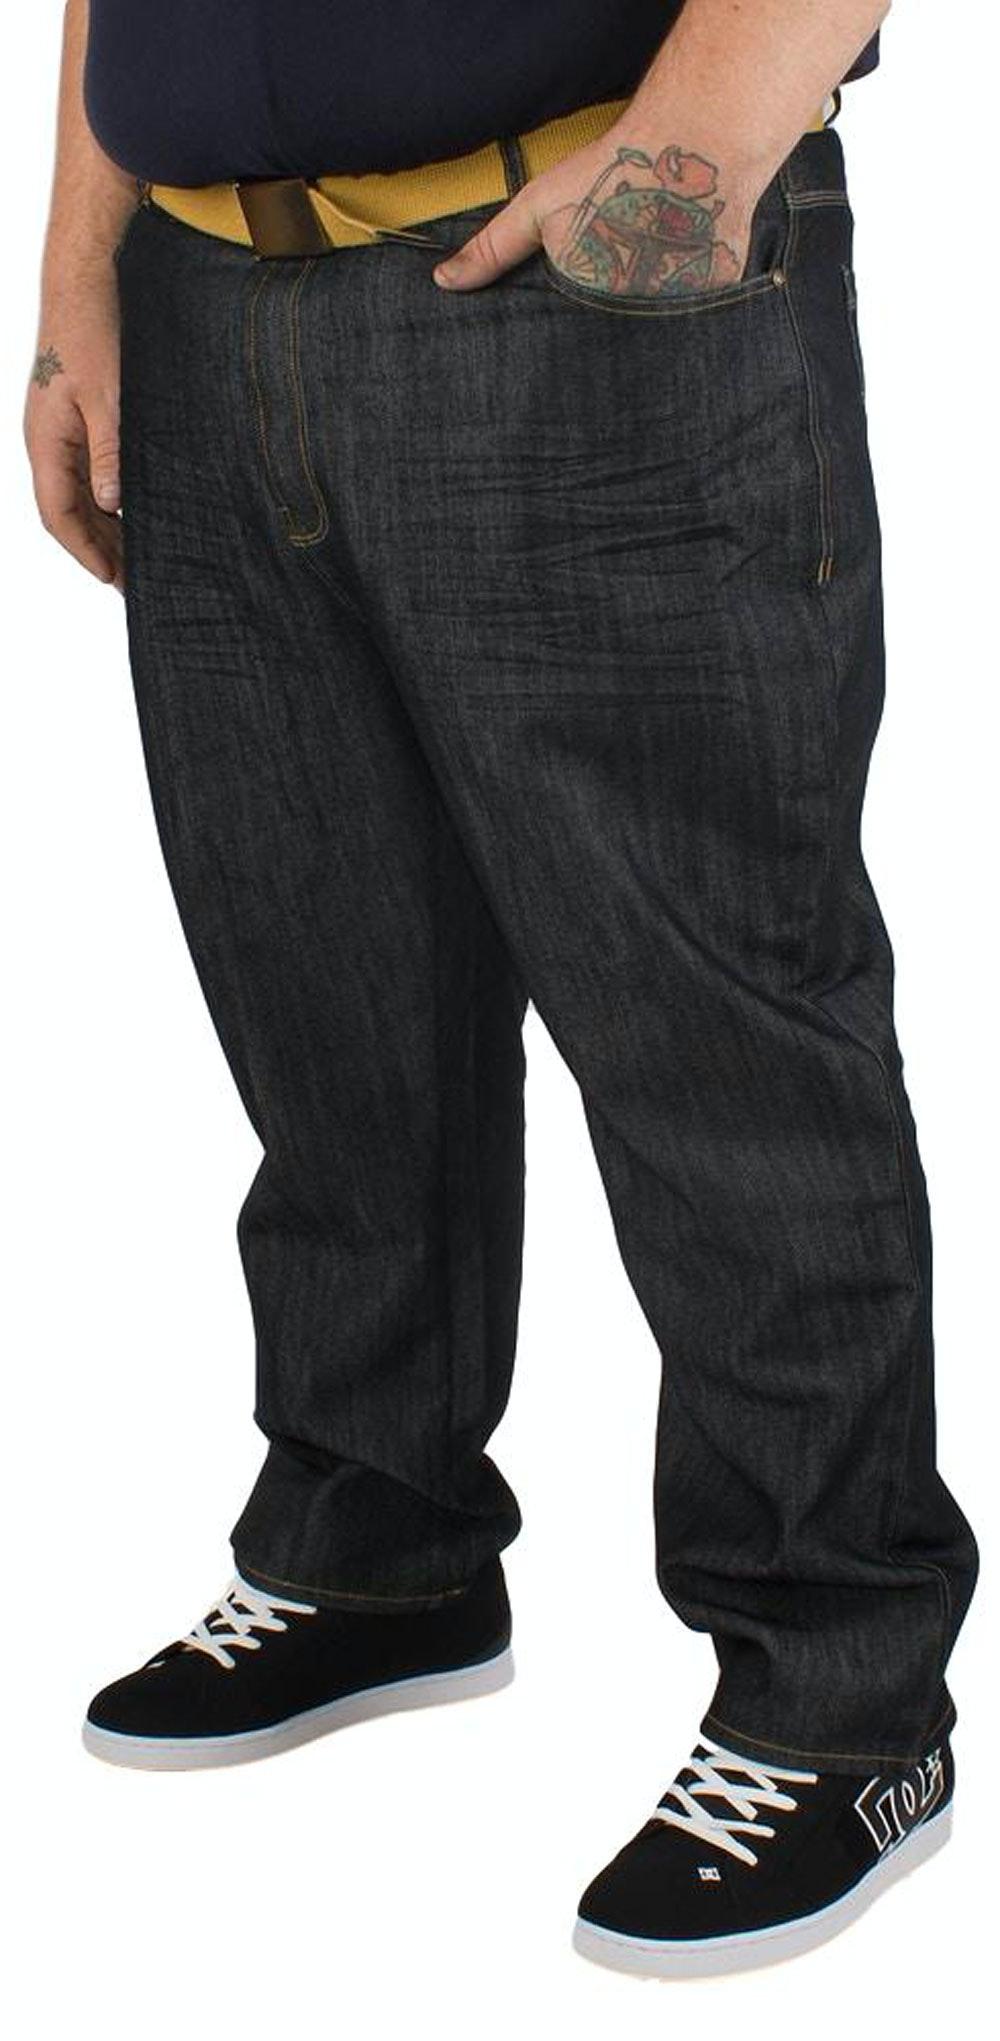 Kaymans Kori Jeans Black